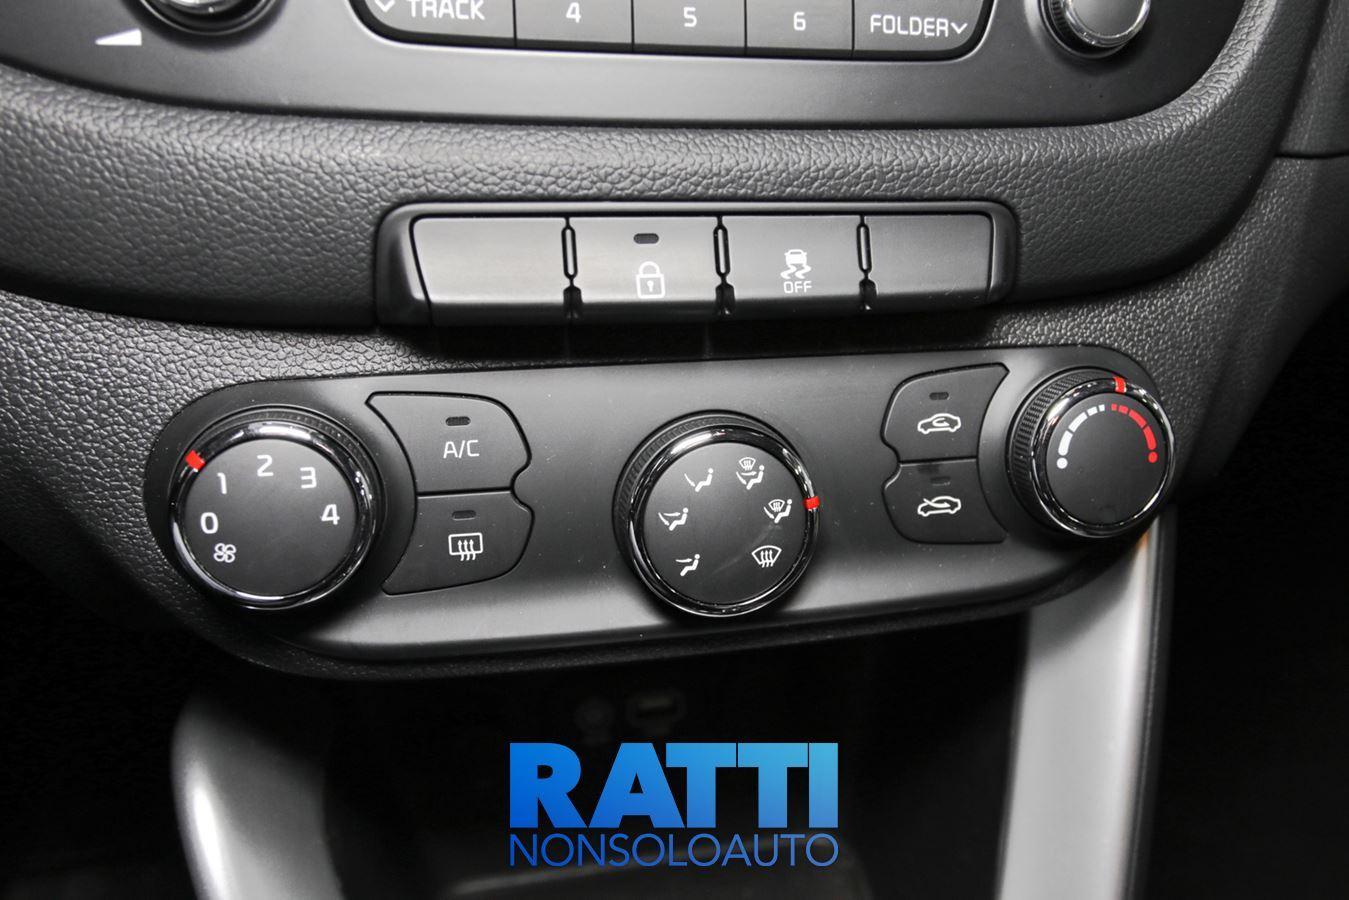 KIA CEED FL 1.6 110 CV DS ACTIVE E DRV TT 17